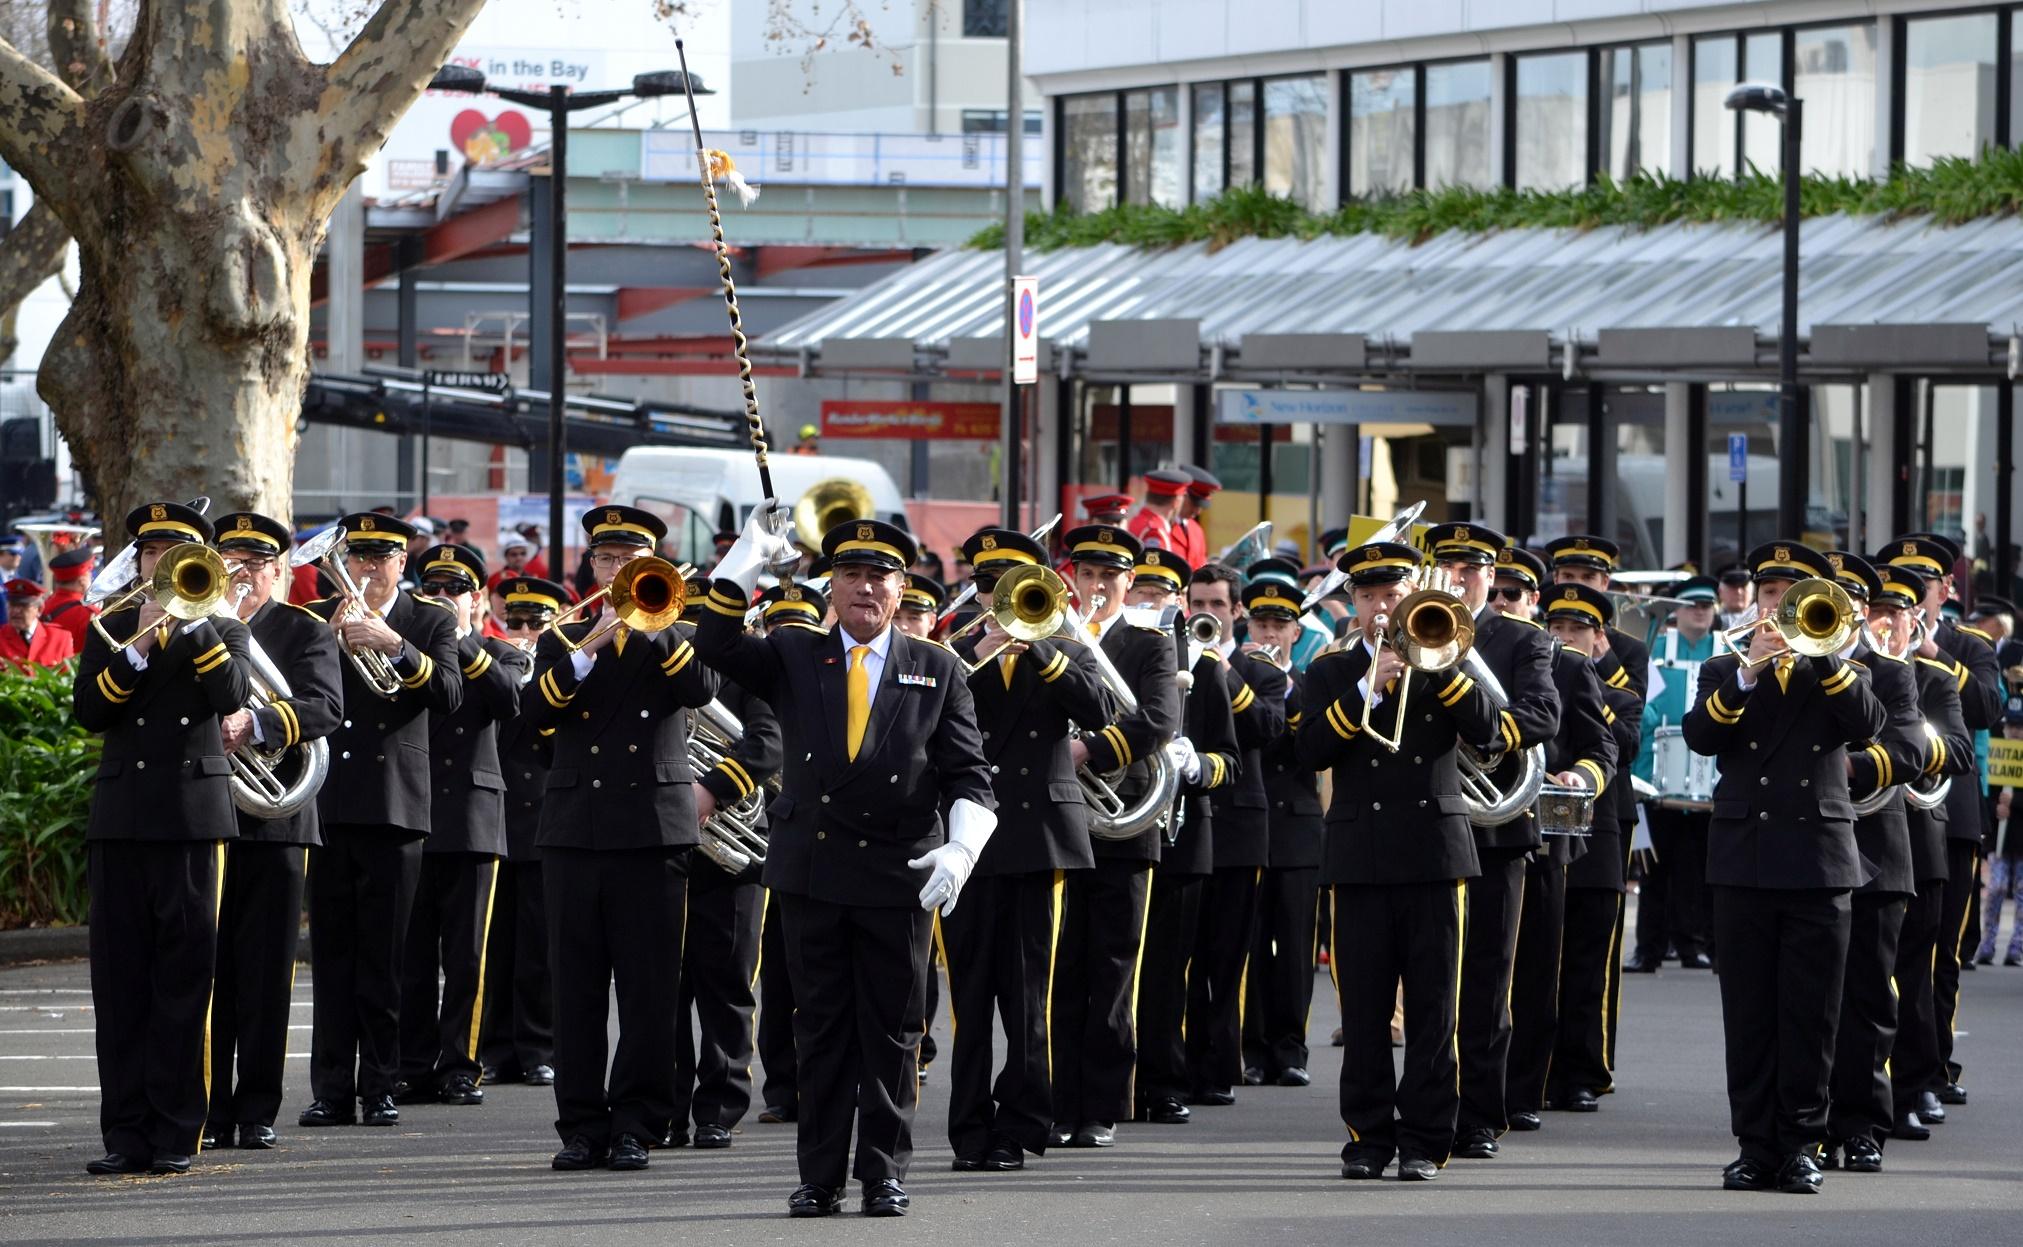 Wellington Brass